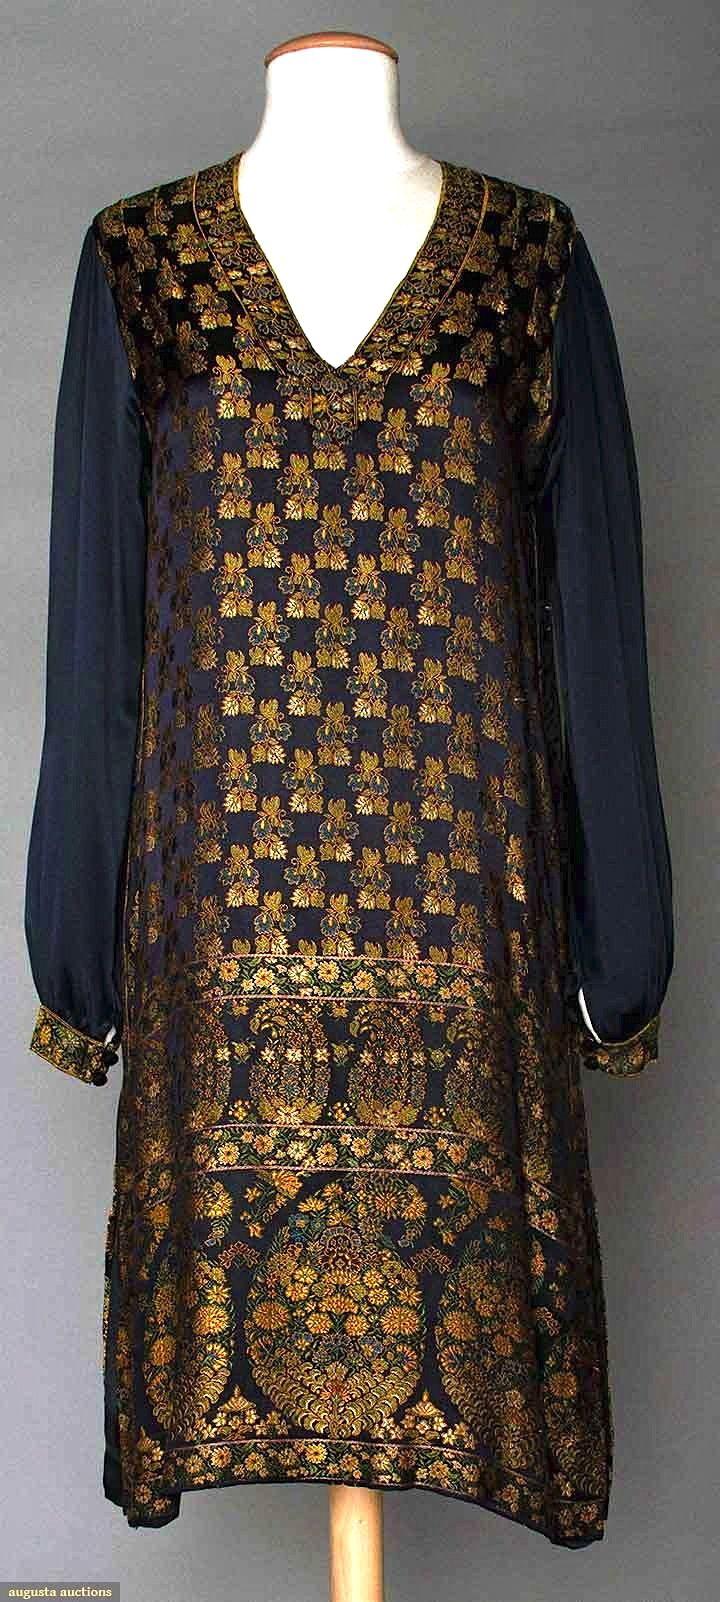 S silk brocade day dress navy satin ground wpersian inspired